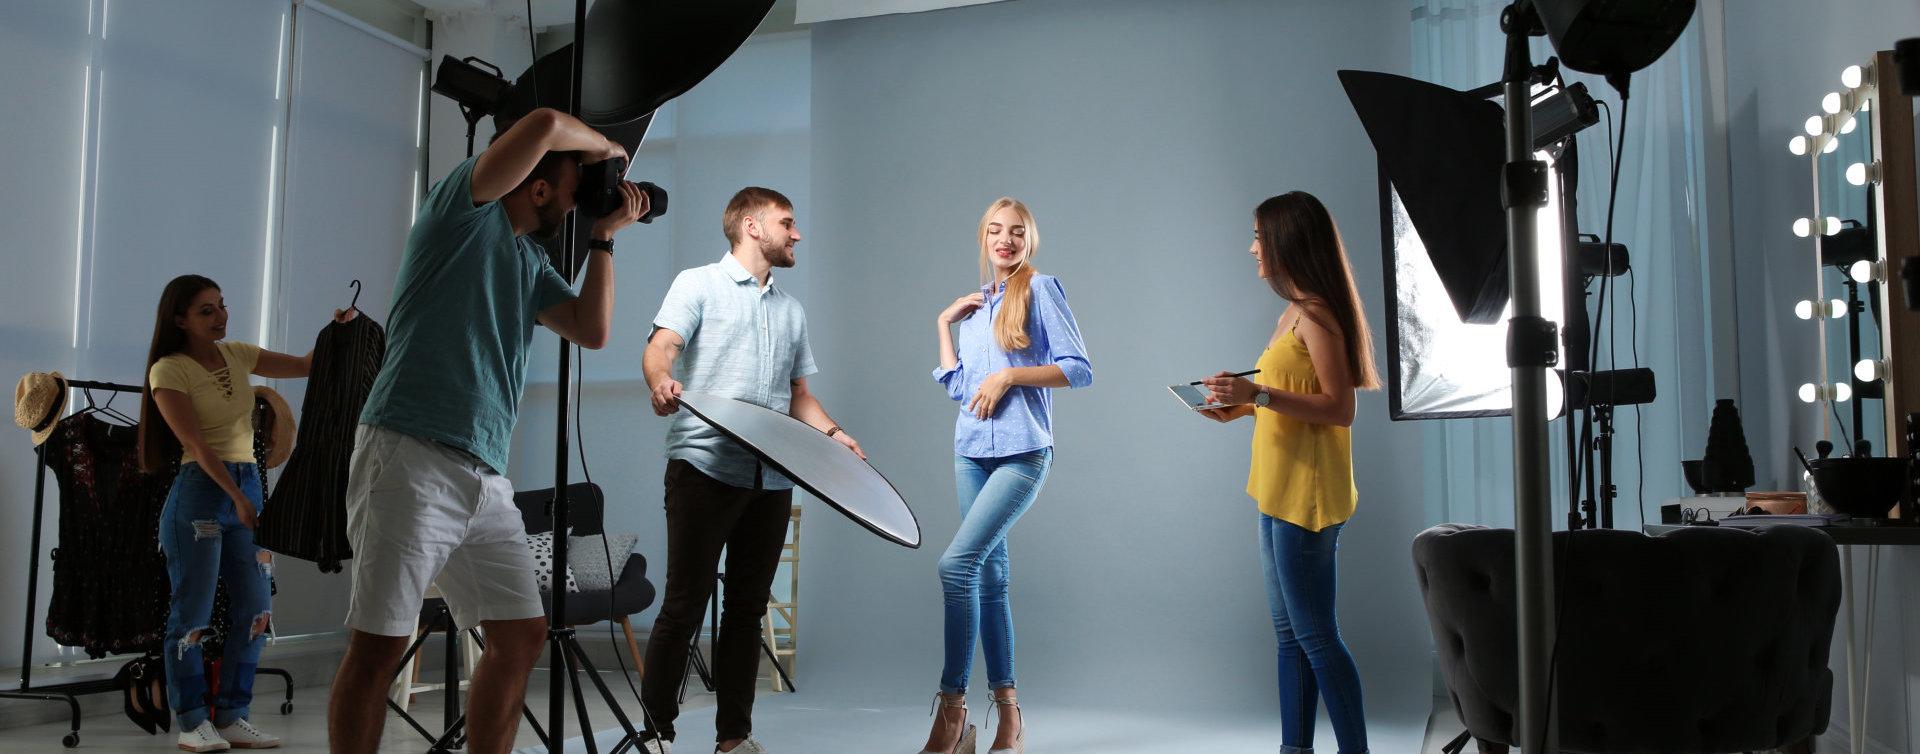 photo shoot with girl model